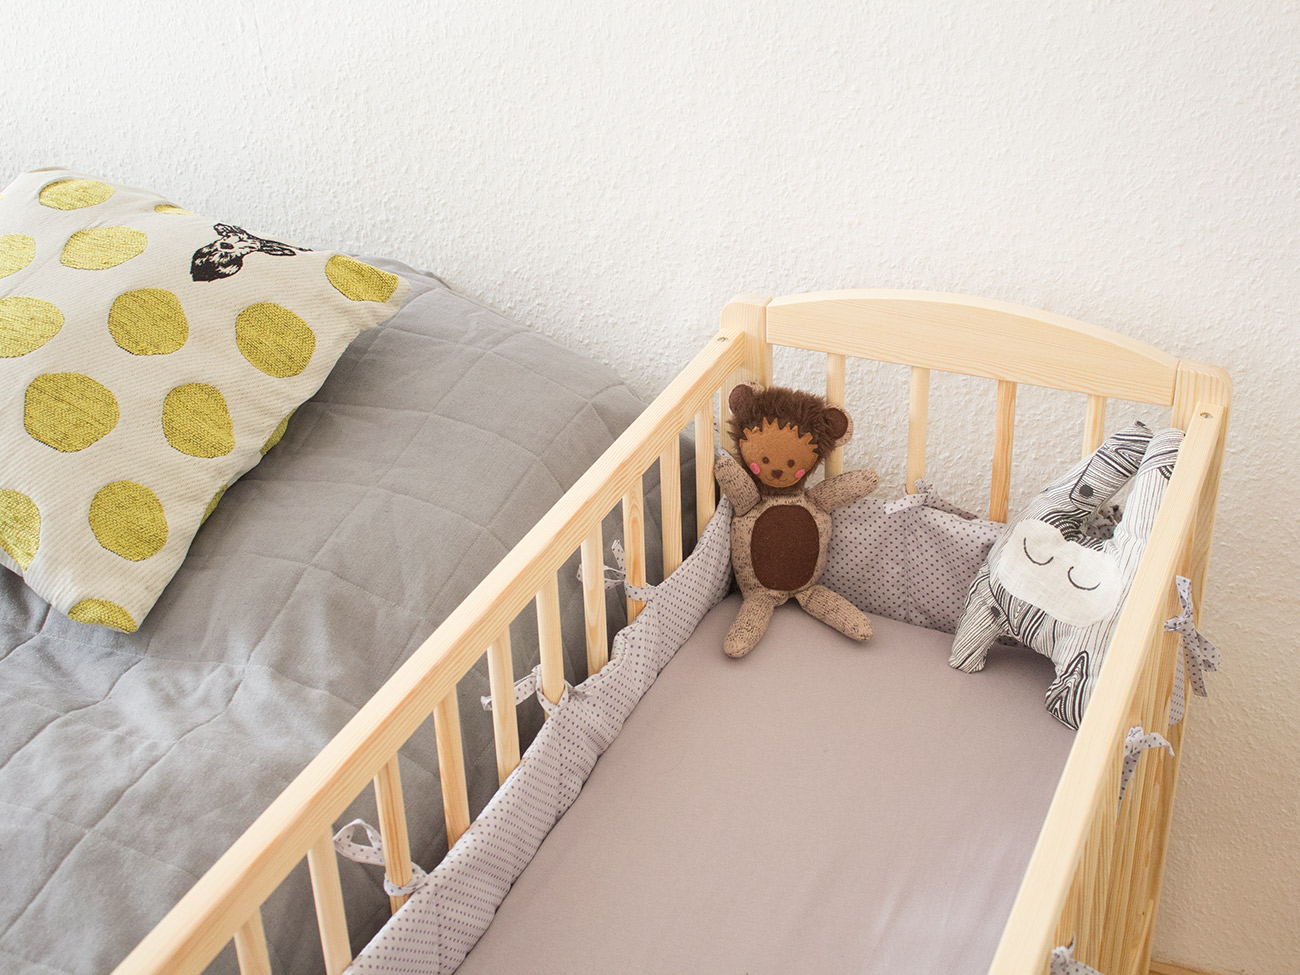 Nähanleitung bettnestchen bettlaken fürs babybett